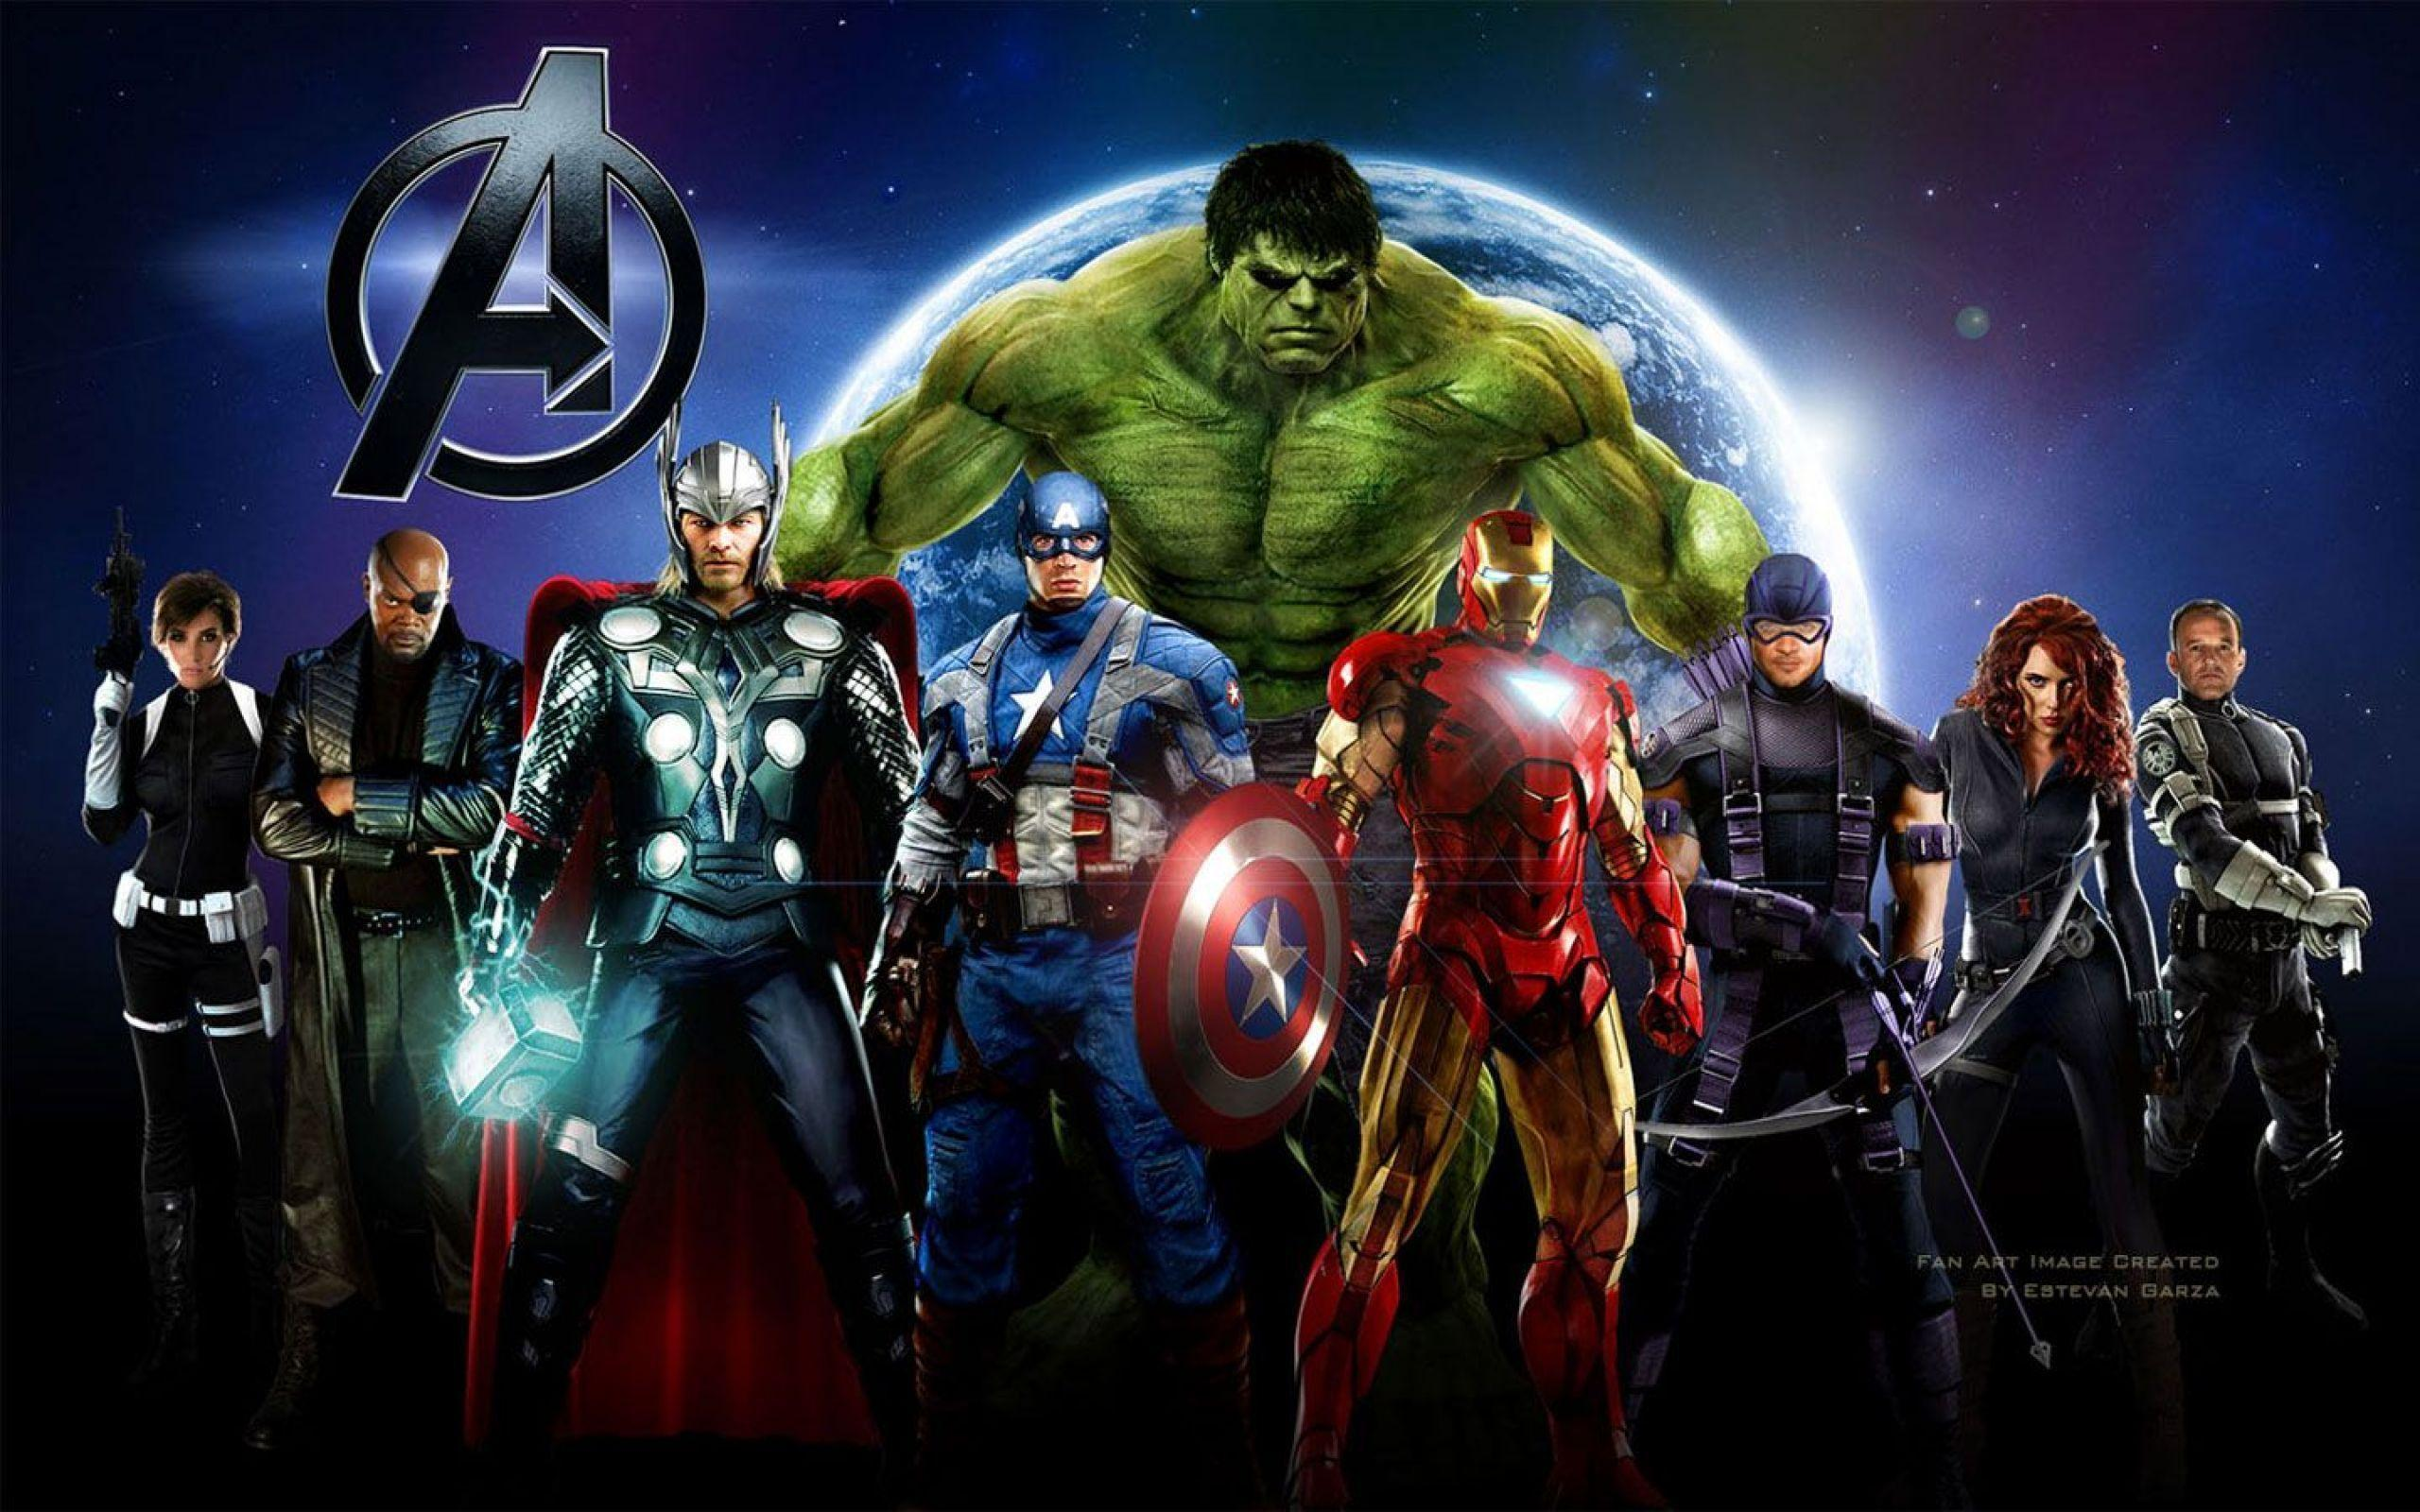 Avenger Wallpapers - Full HD wallpaper search